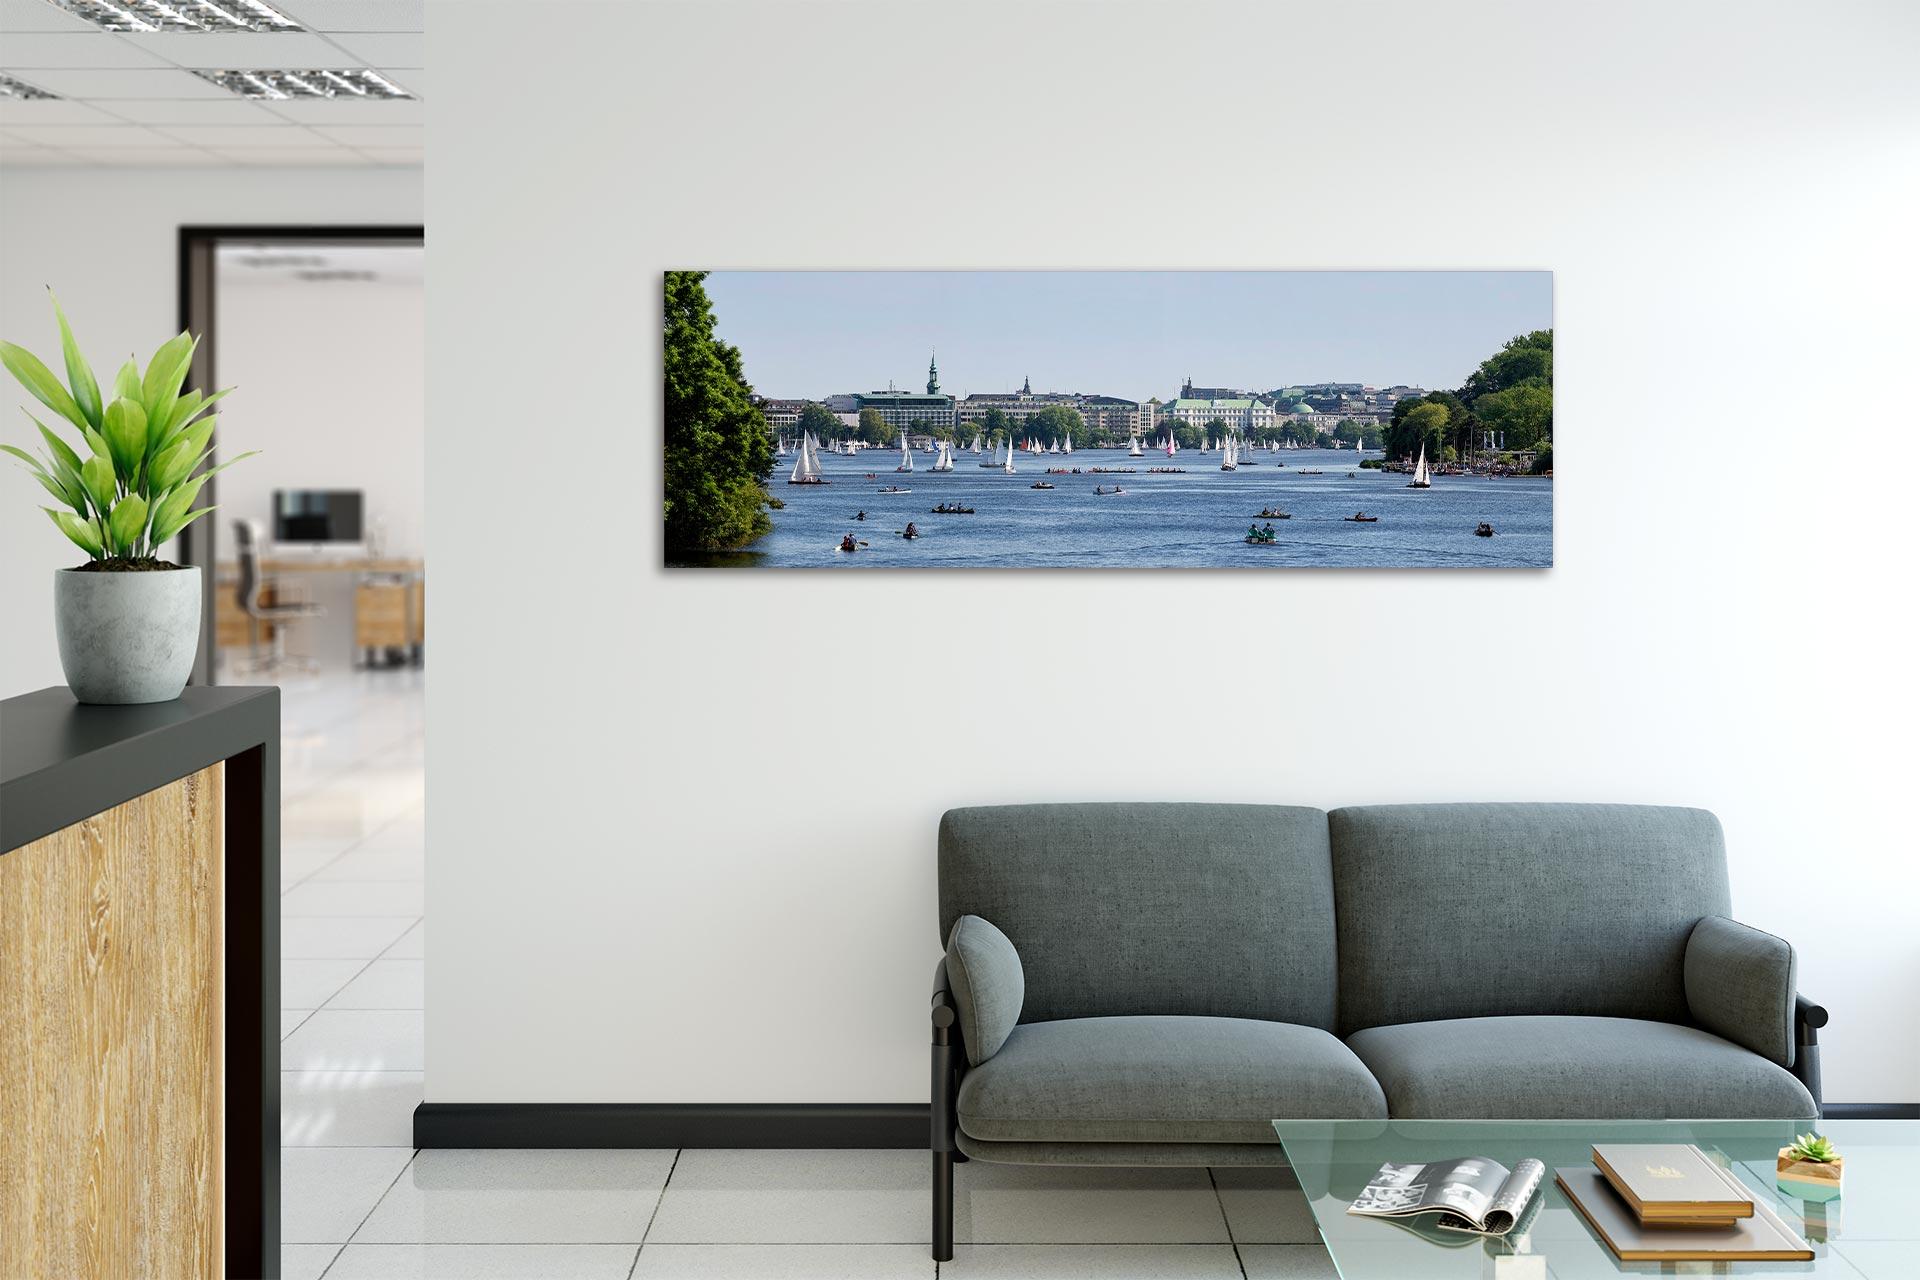 PSW027-panorama-alster-segeln-leinwand-acrylglas-aludibond-empfang